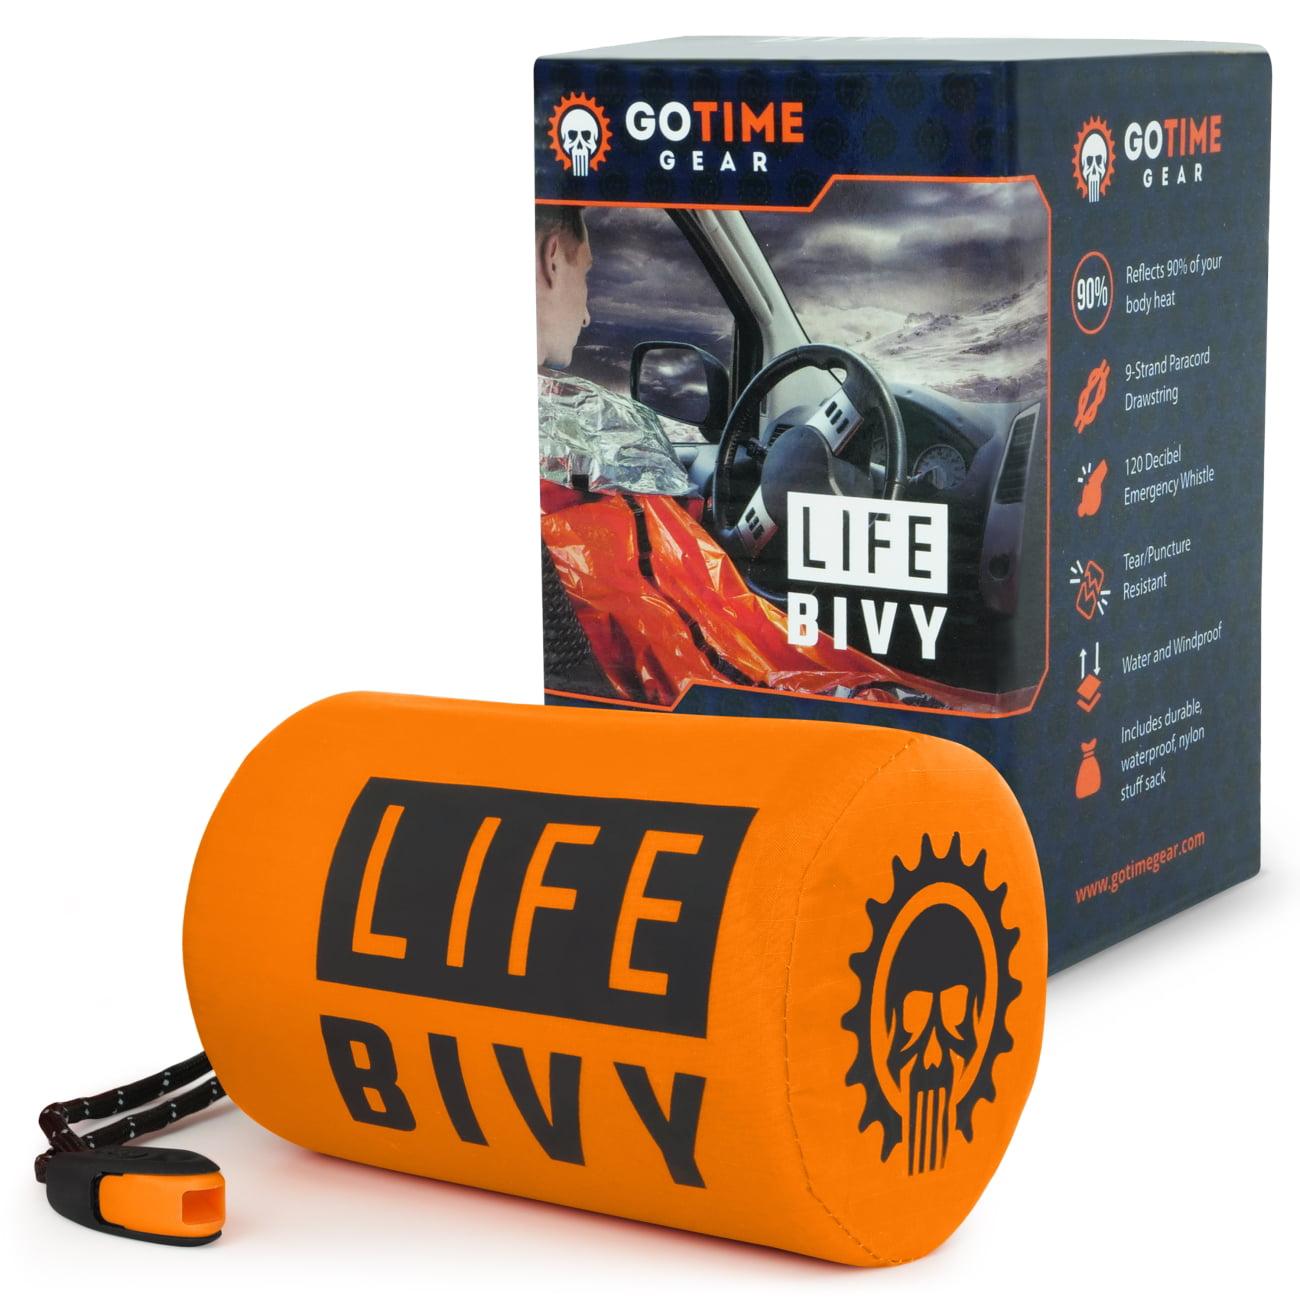 Life Bivy Emergency Sleeping Bag Thermal Bivvy Use as Emergency Bivy Bag, Survival Sleeping Bag, Mylar Emergency Blanket, Survival Gear... by Go Time Gear